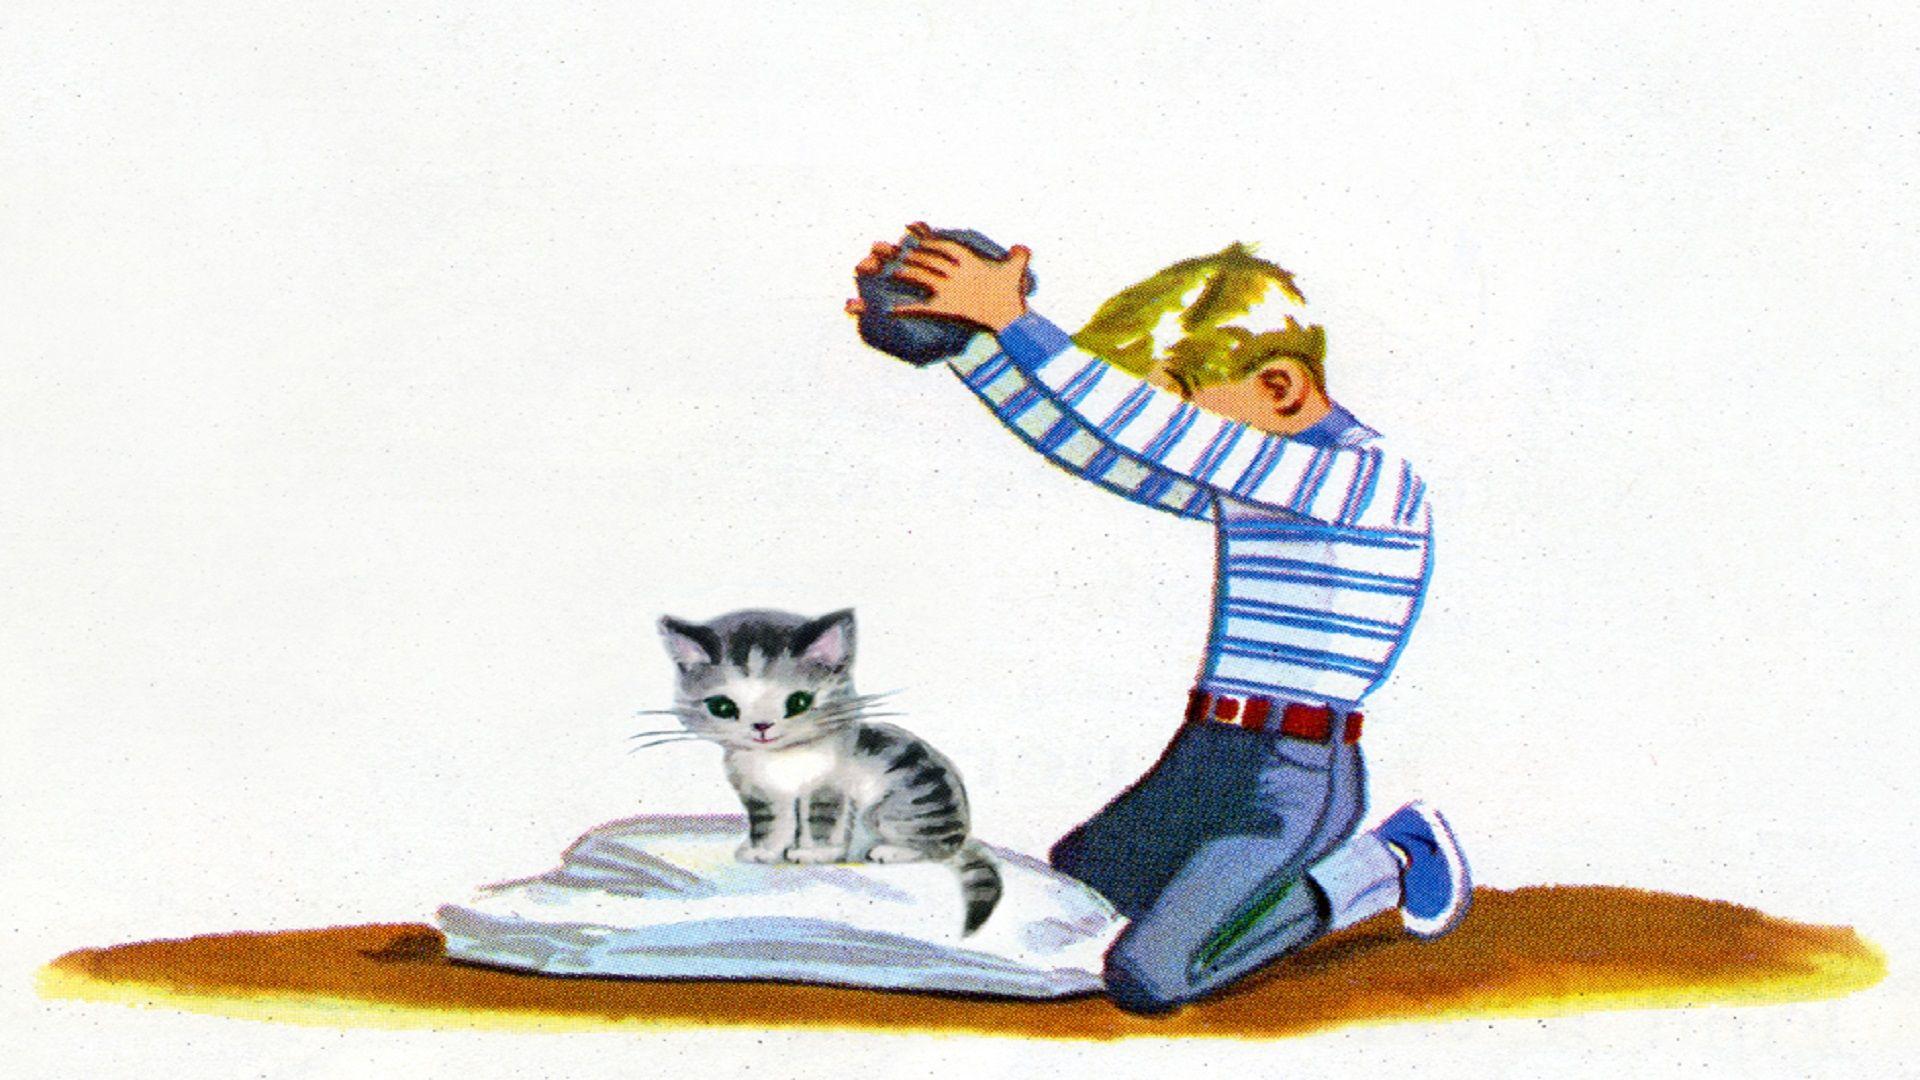 Cat Wallpaper [1920x1080] | Reddit HD Wallpapers | Wallpaper, Cat wallpaper, Hd wallpaper